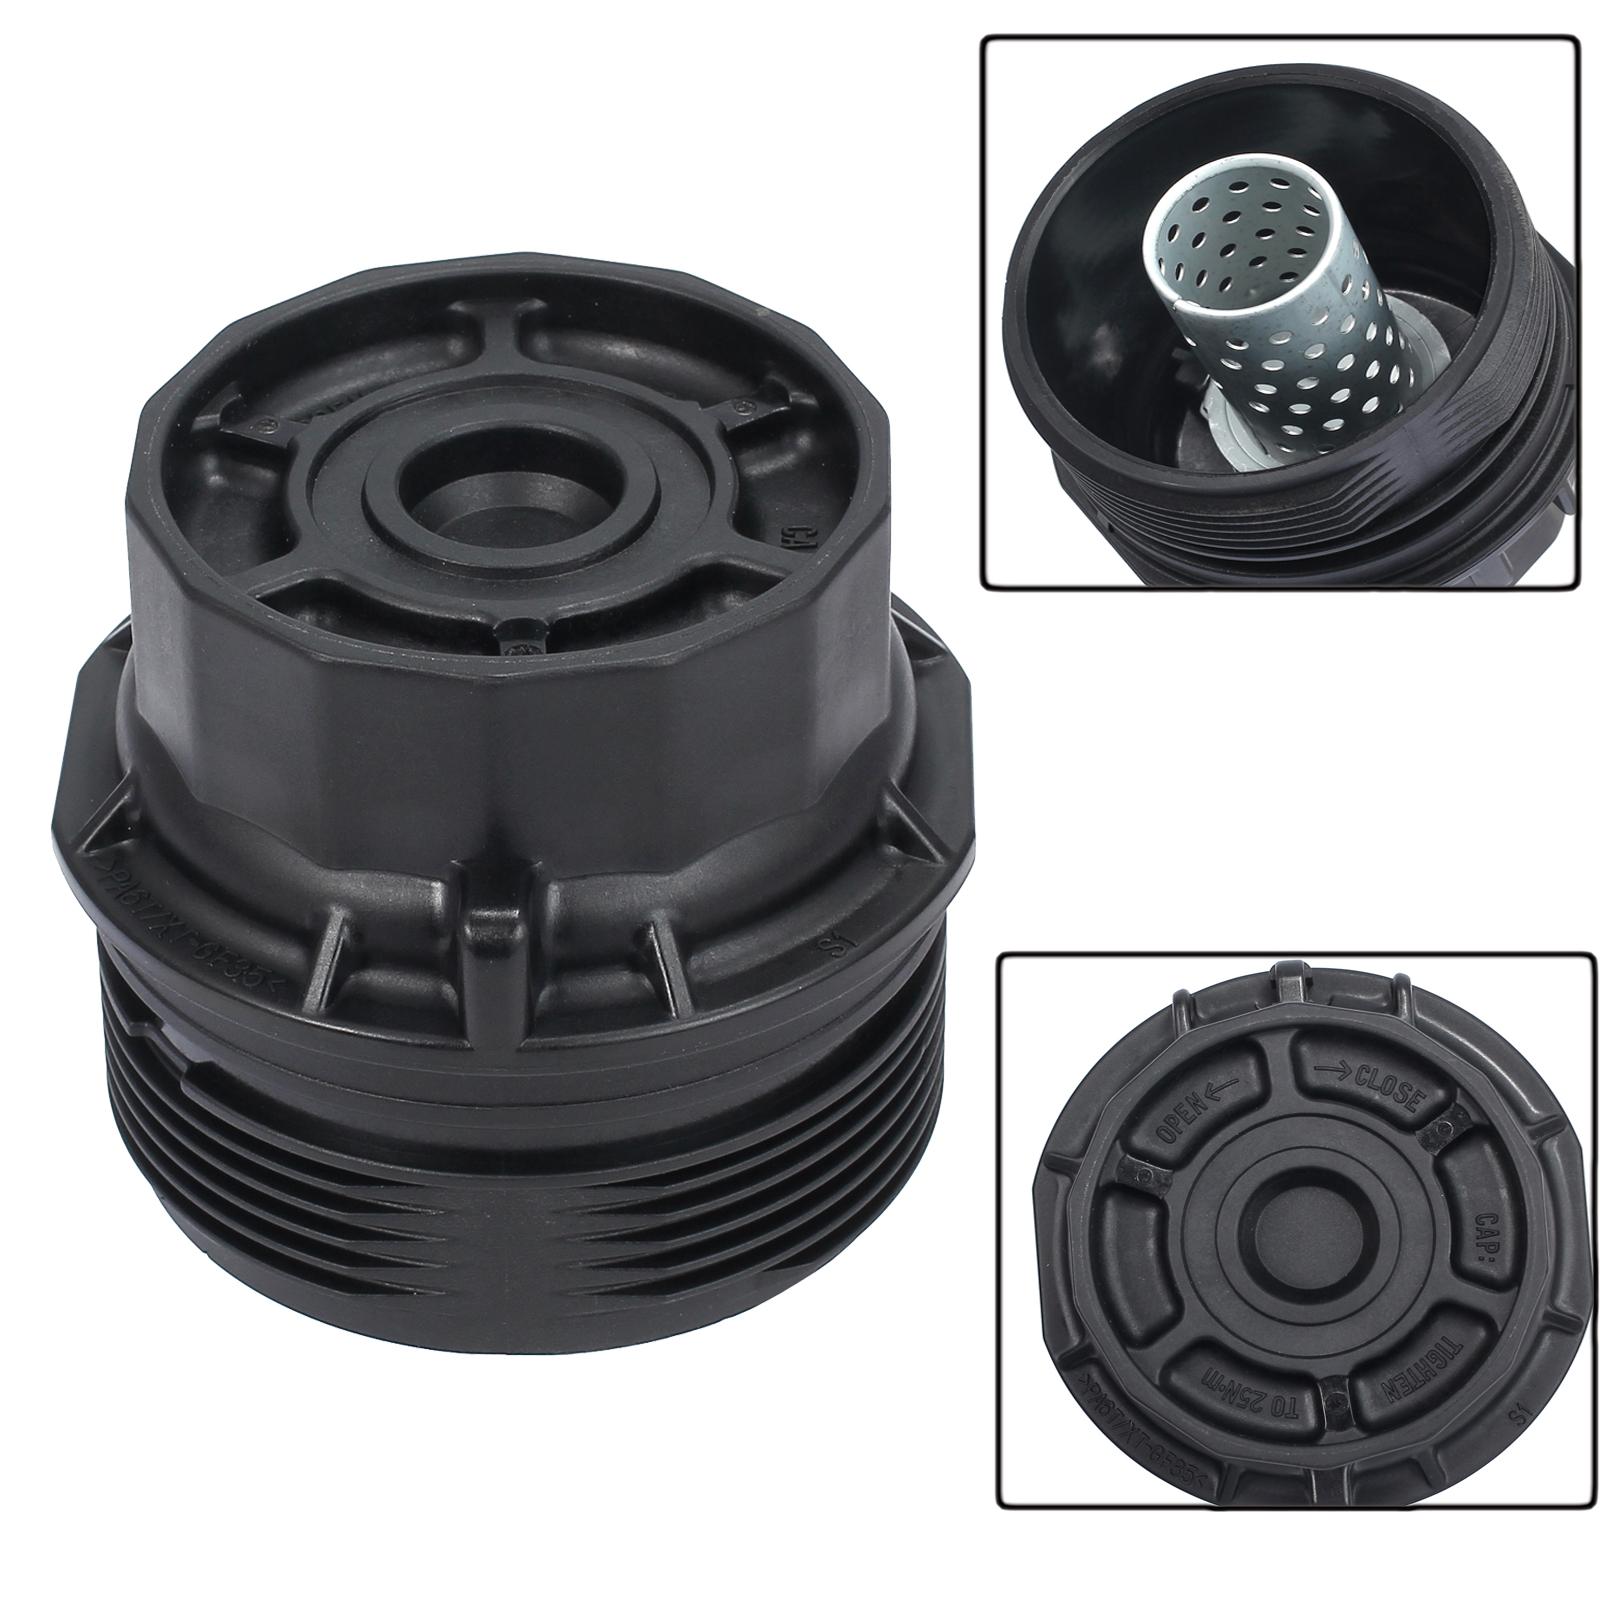 Oil Filter Housing Cover Cap Trim Assembly For Toyota Lexus Scion 15620 37010 Ebay